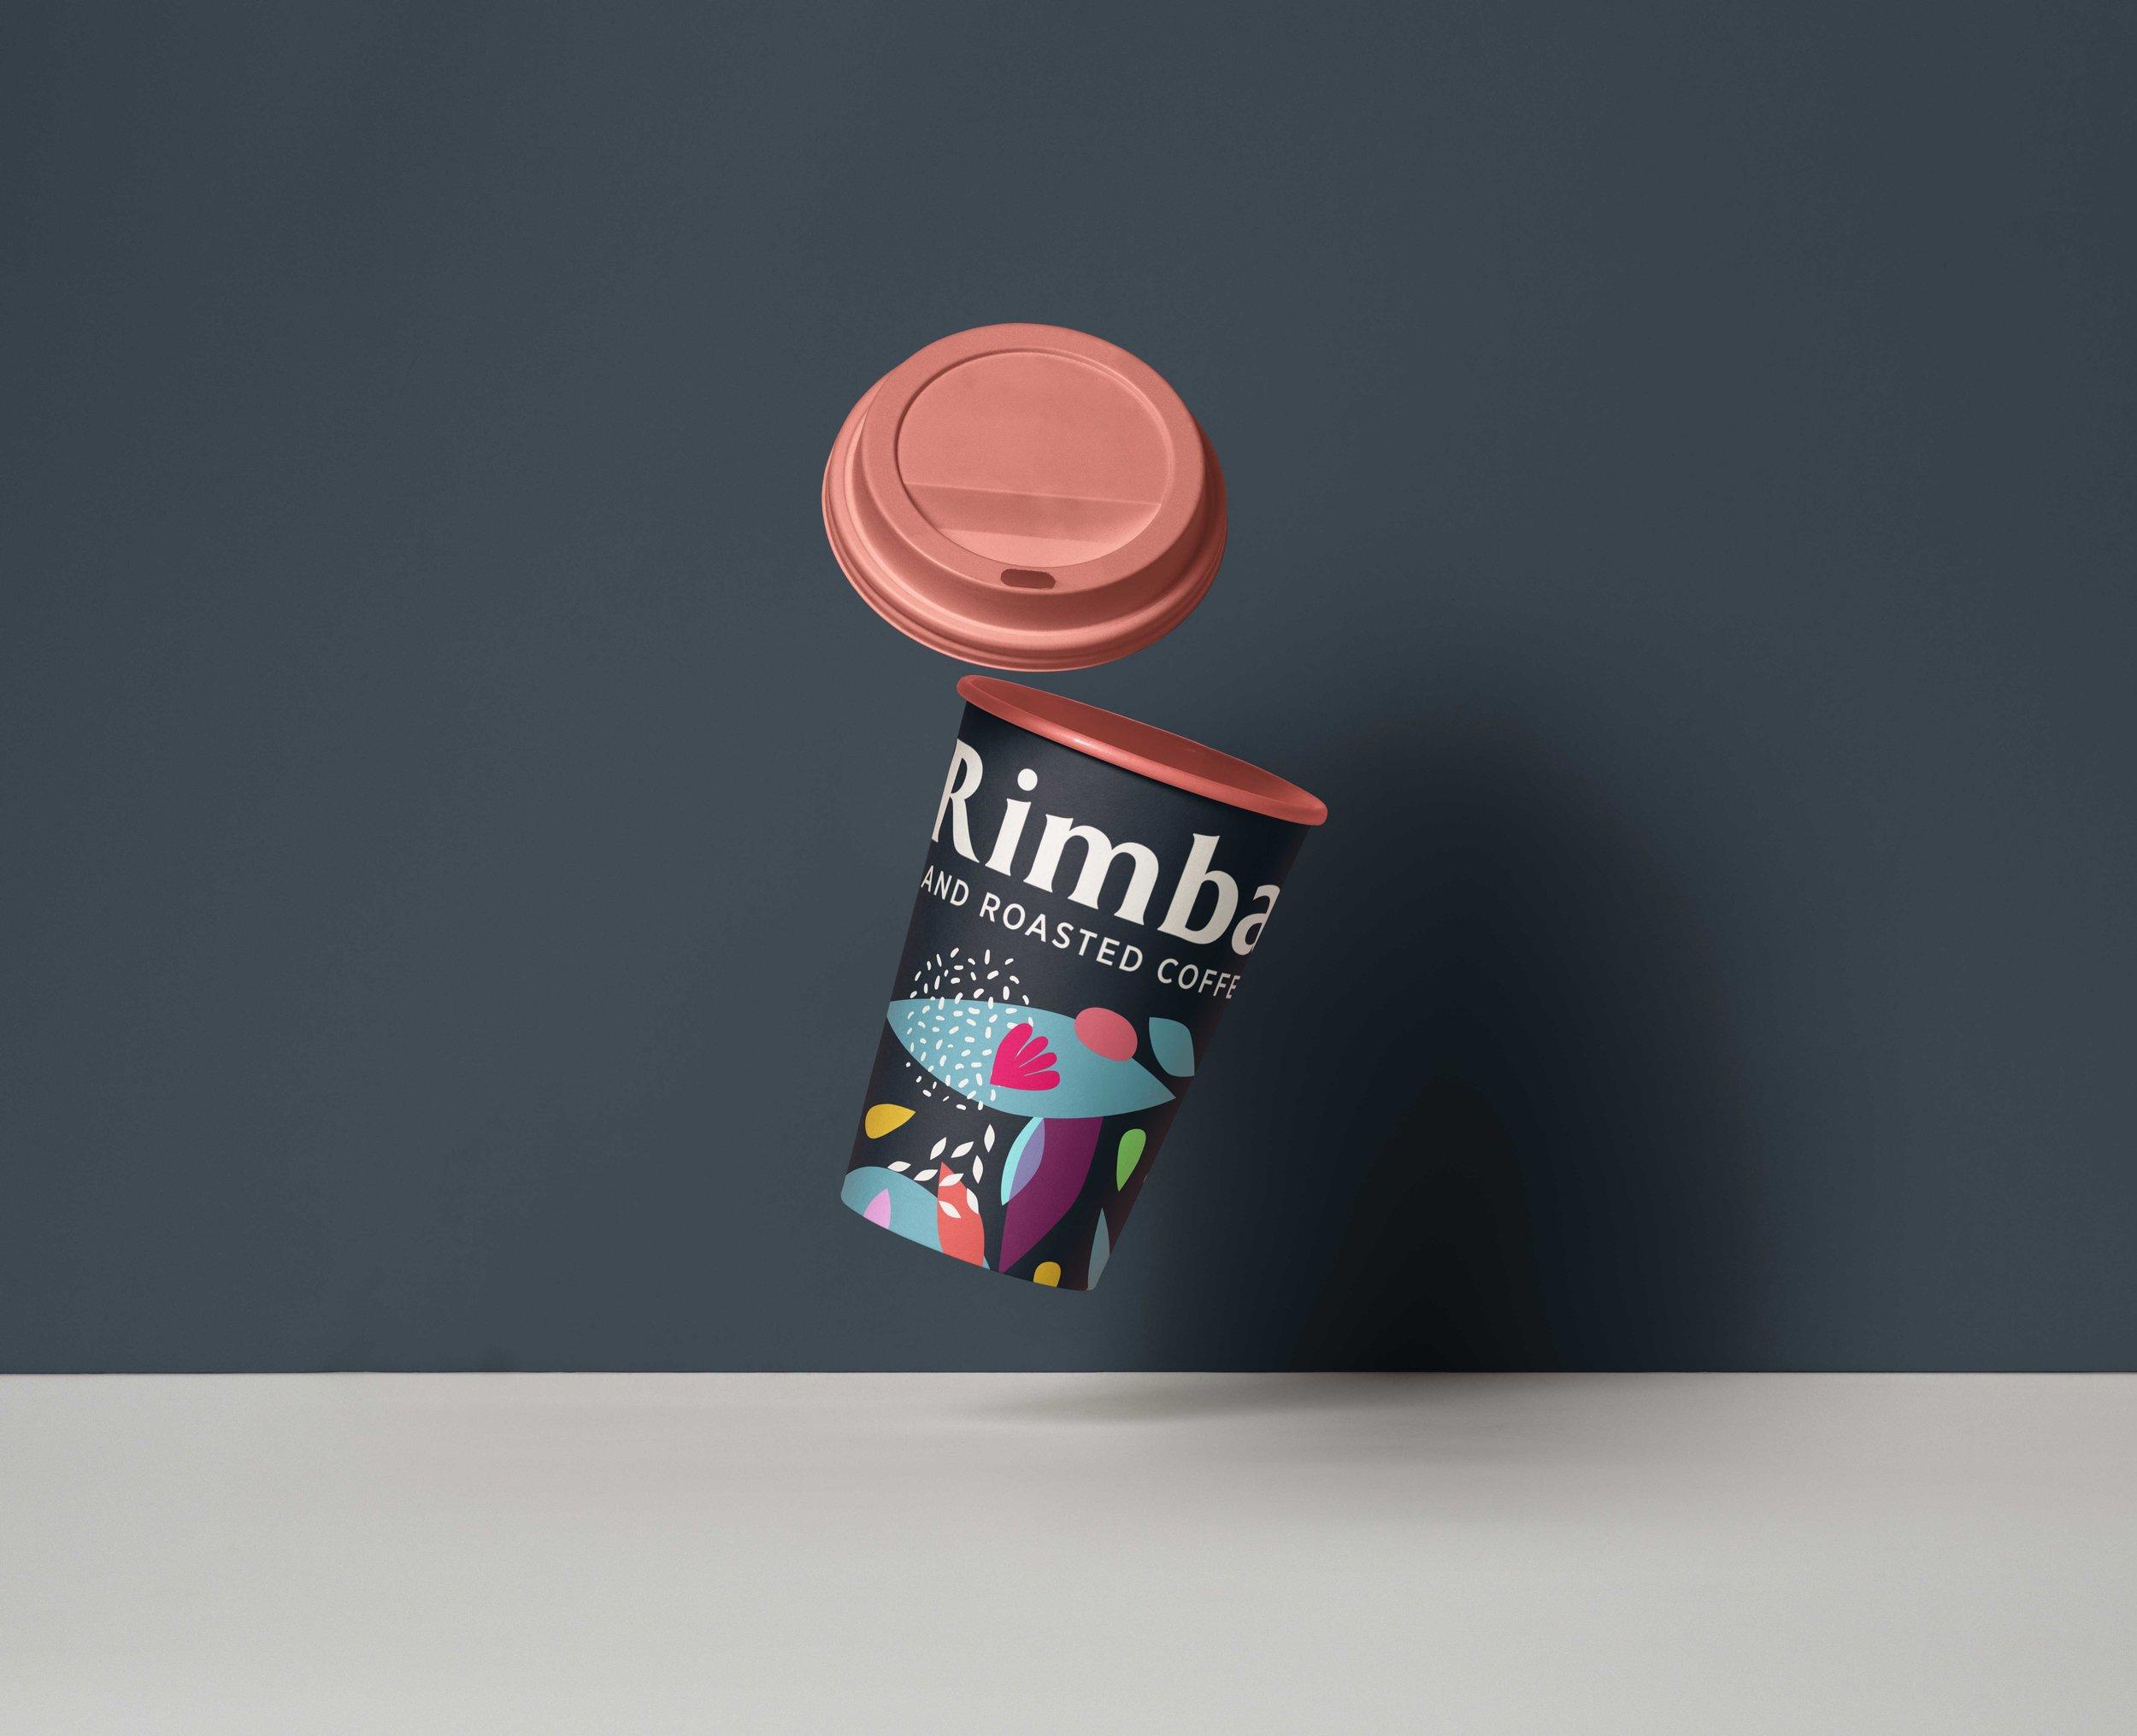 Dmitry Kropachev Creativity - Rimba 3.jpg